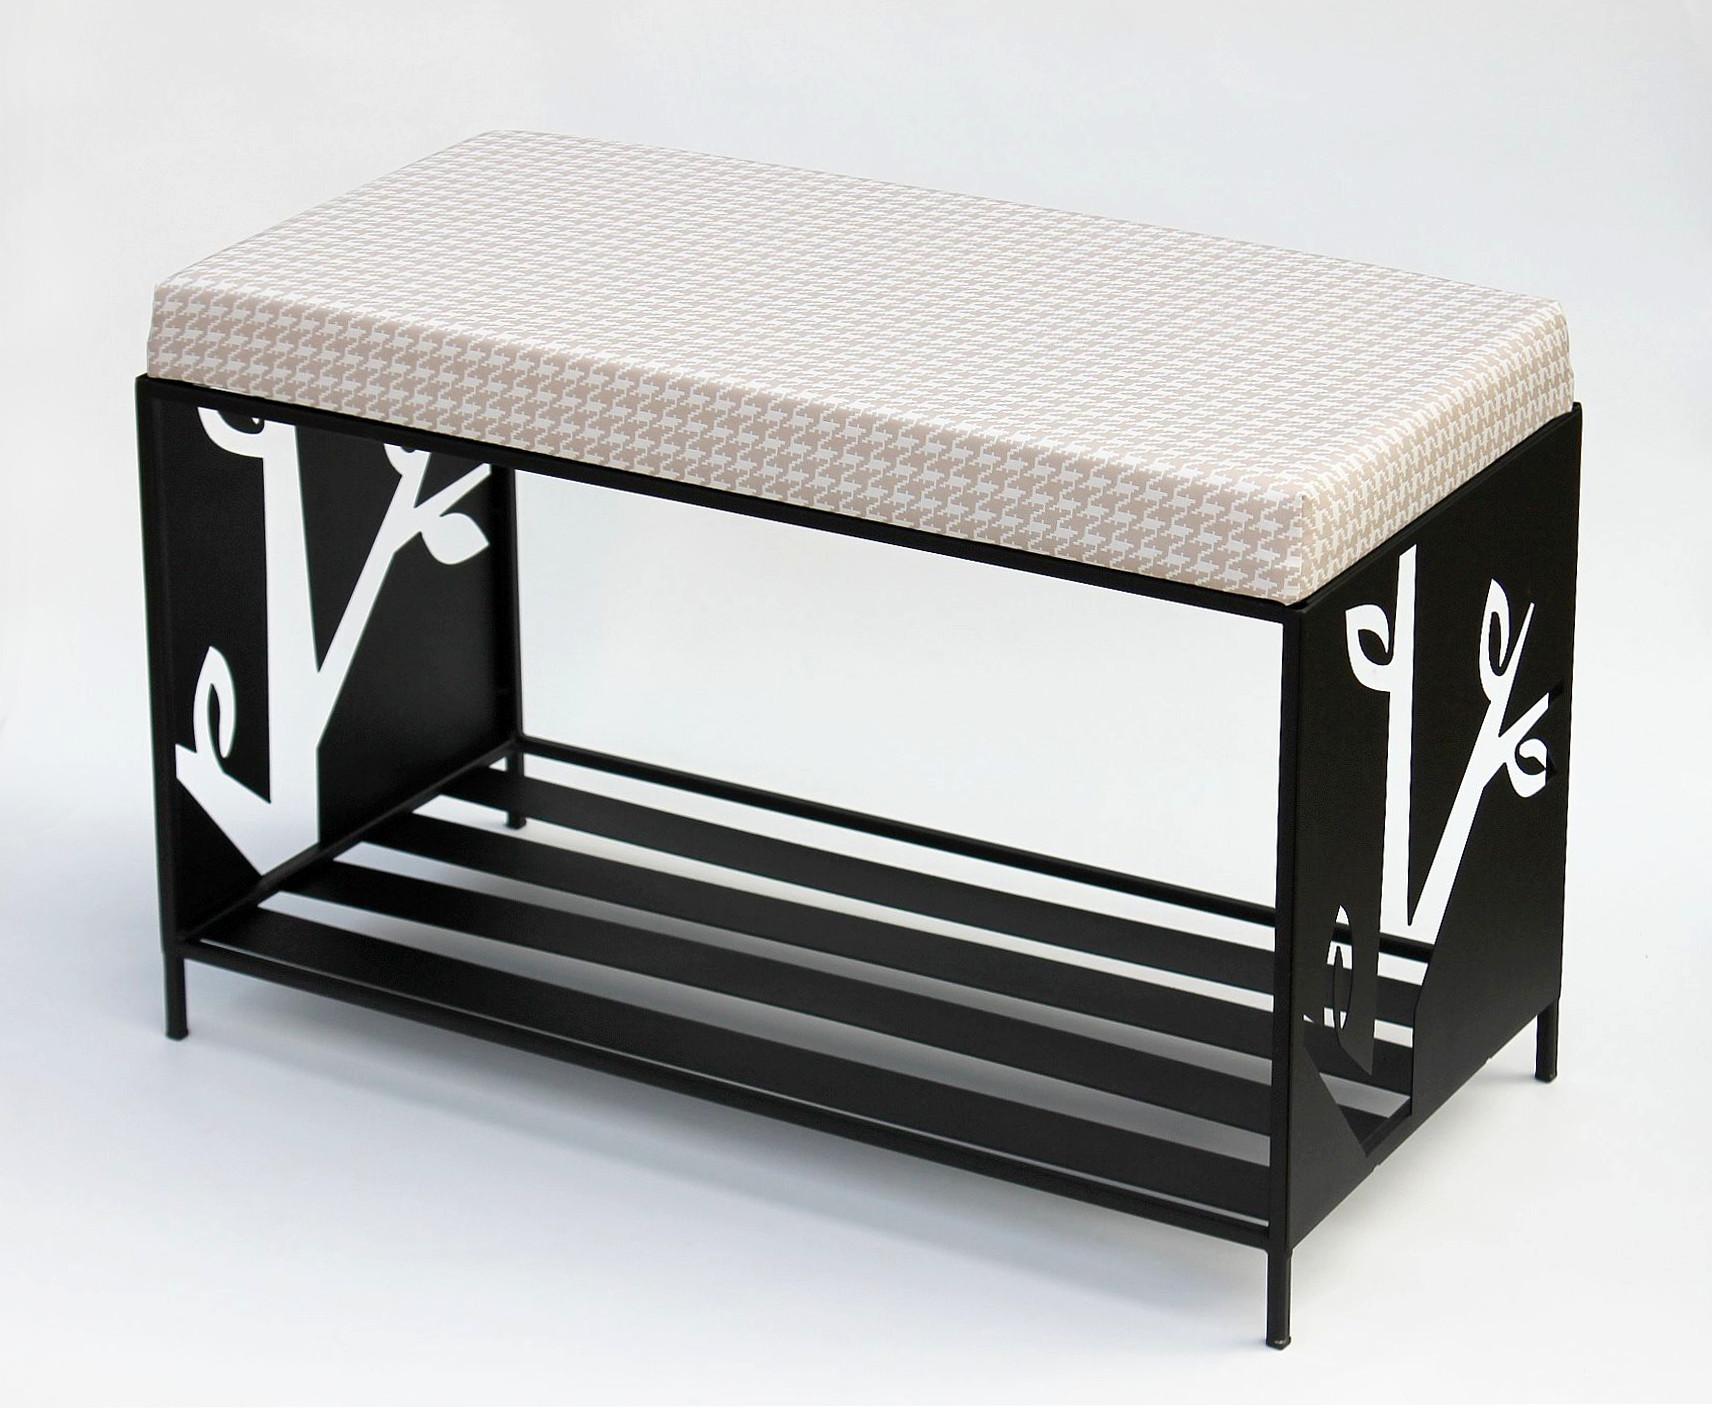 schuhregal mit sitzfl che metall schwarz 70 cm 10 15051 schuhregal schuhschrank dandibo. Black Bedroom Furniture Sets. Home Design Ideas